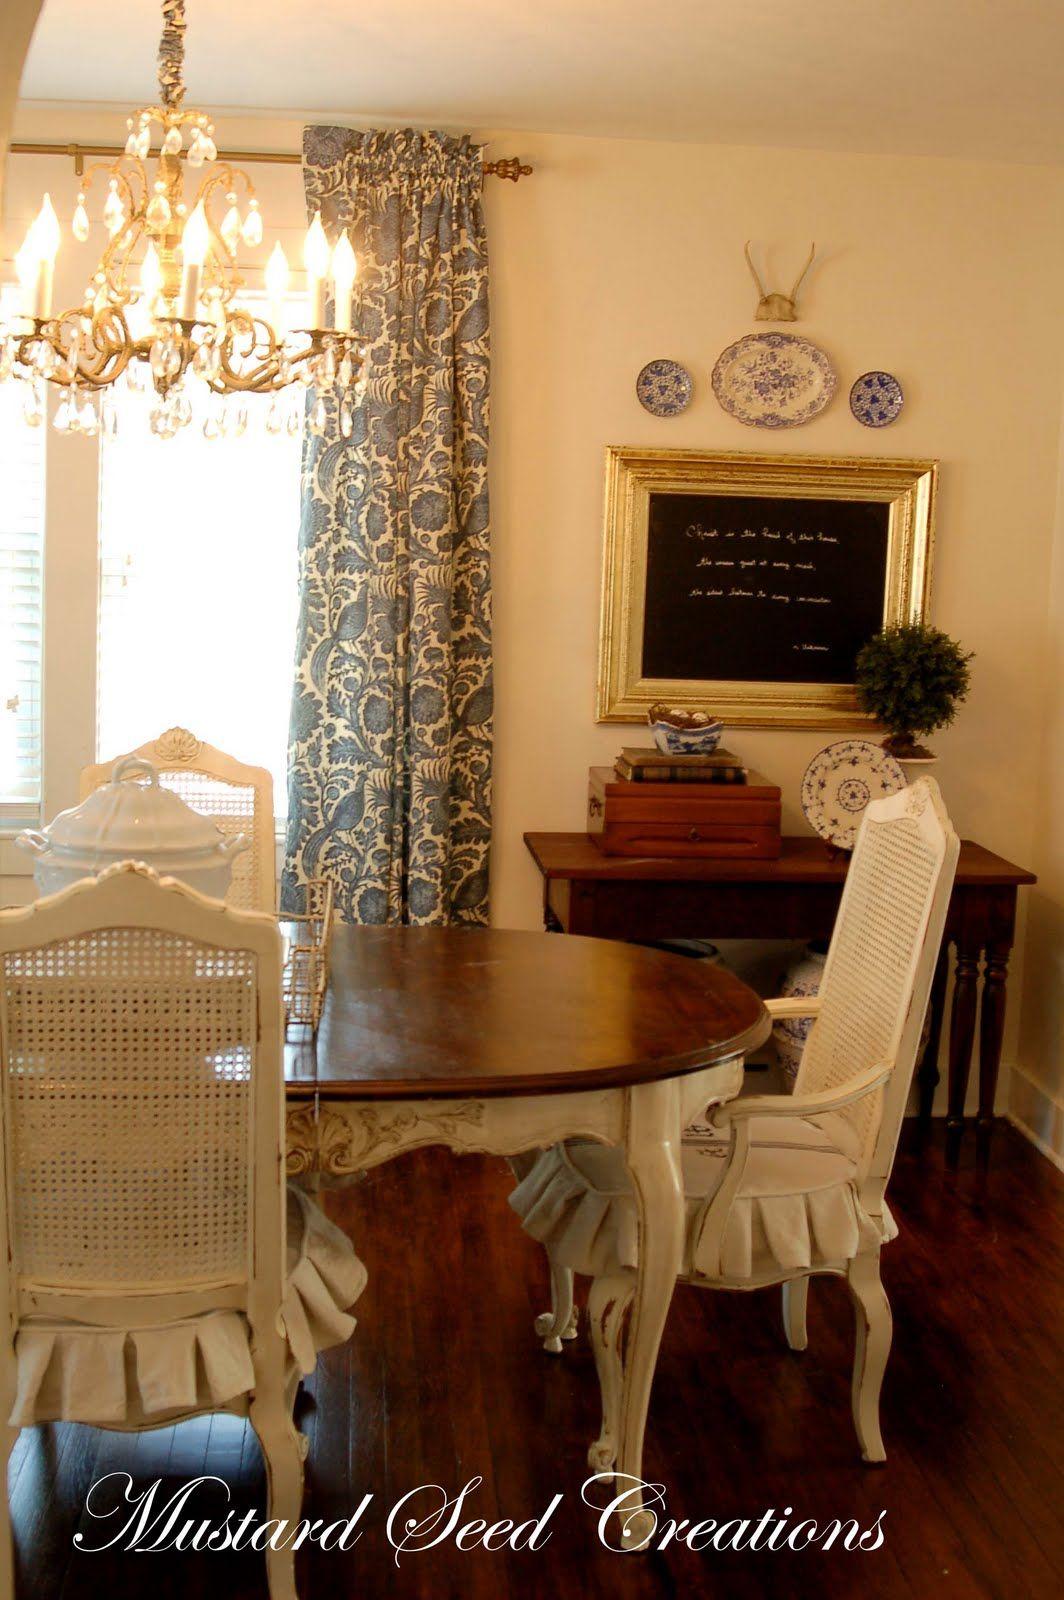 Miss Mustard Seed Dining Room Table